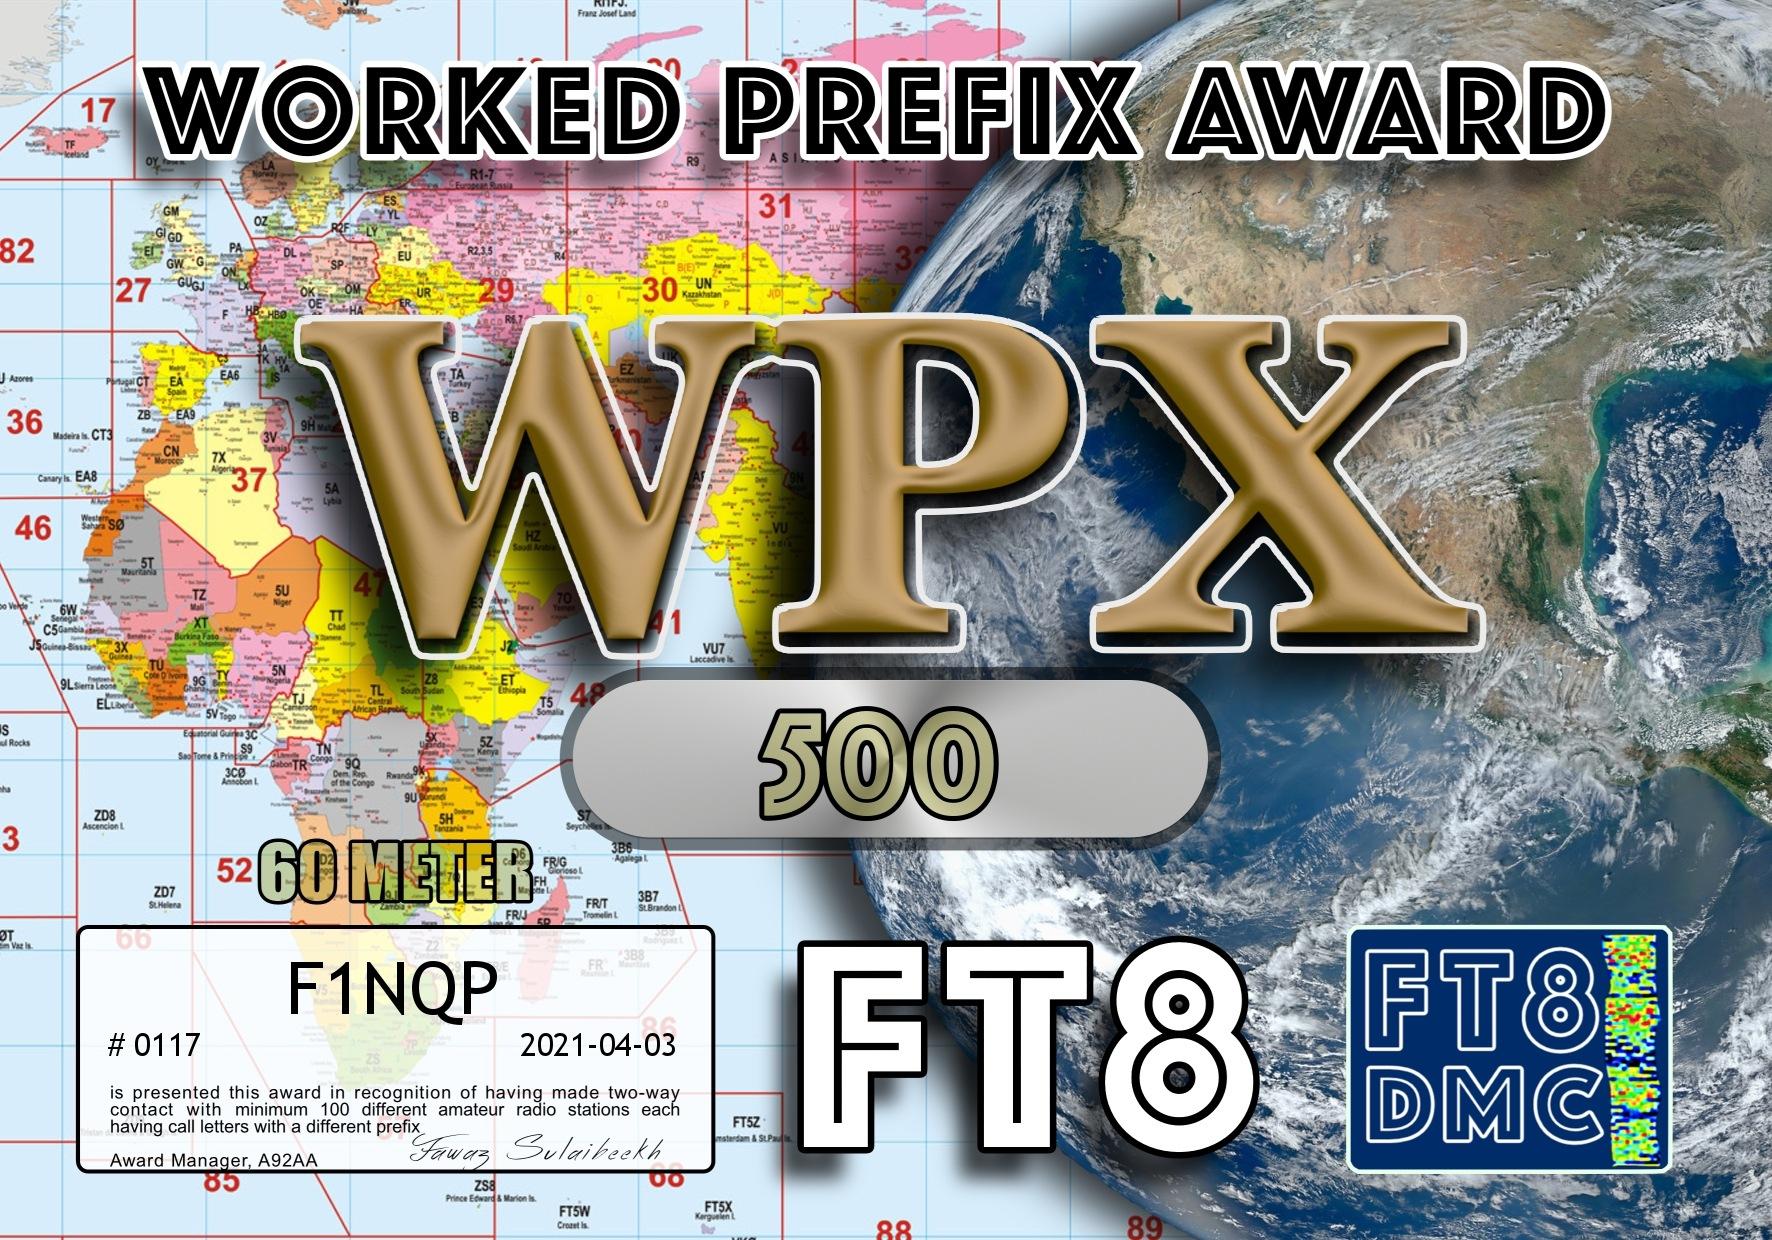 F1NQP-WPX60-500_FT8DMC.jpg